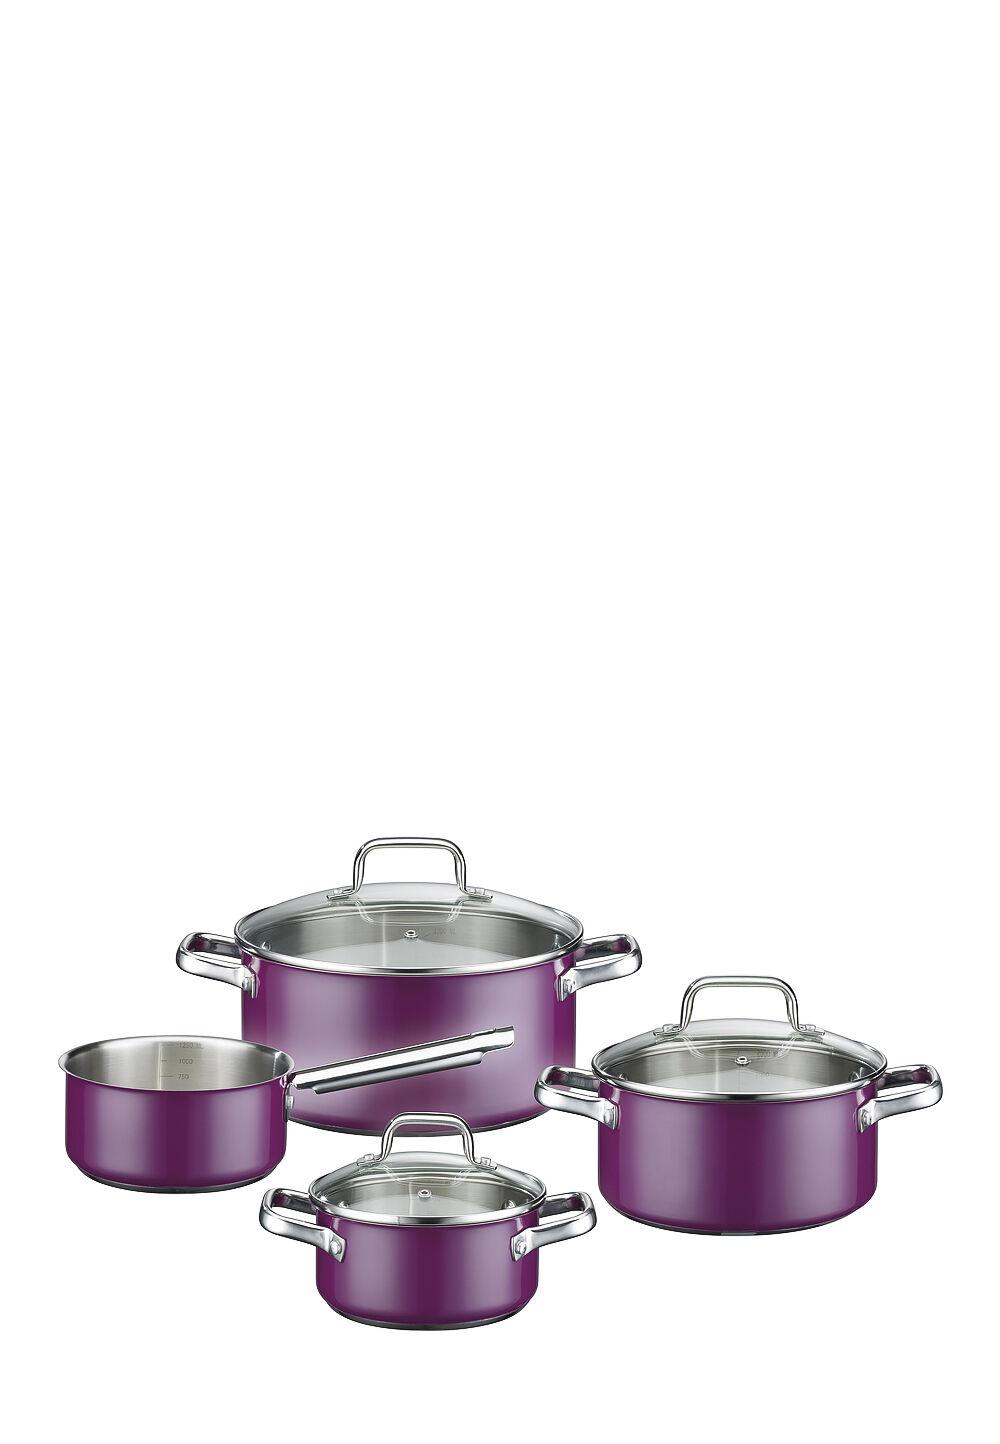 GSW Kochtopf-Set Magic Color, 4-teilig, Edelstahl